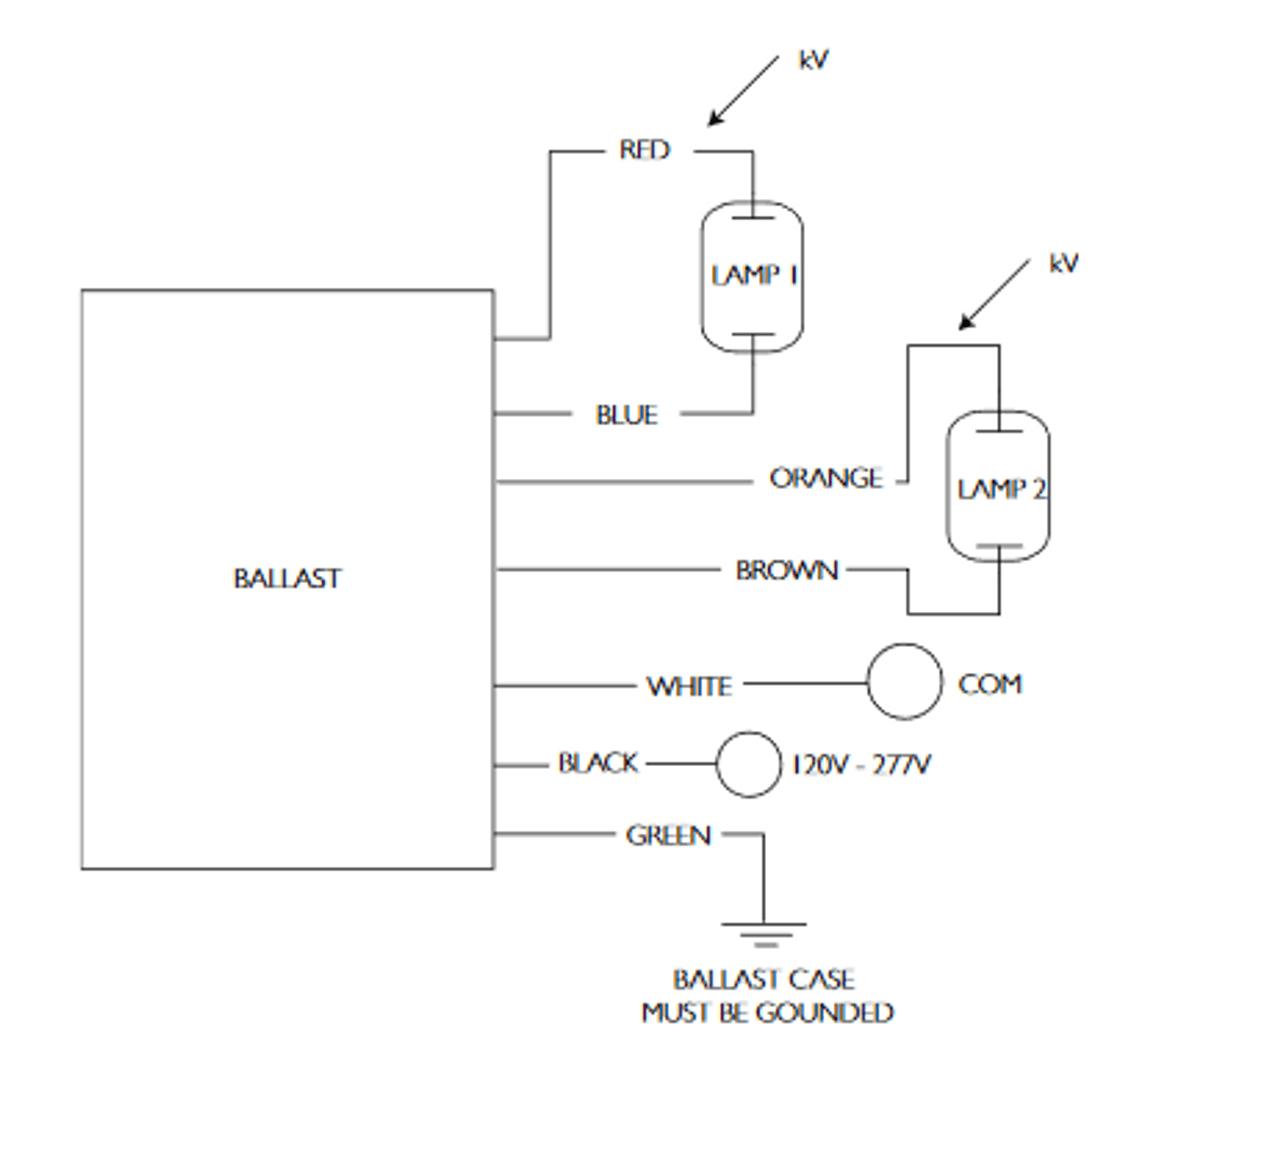 hight resolution of  240v ballast wiring diagram wiring diagram technic on hps ballast wiring diagram bodine emergency advance metal halide